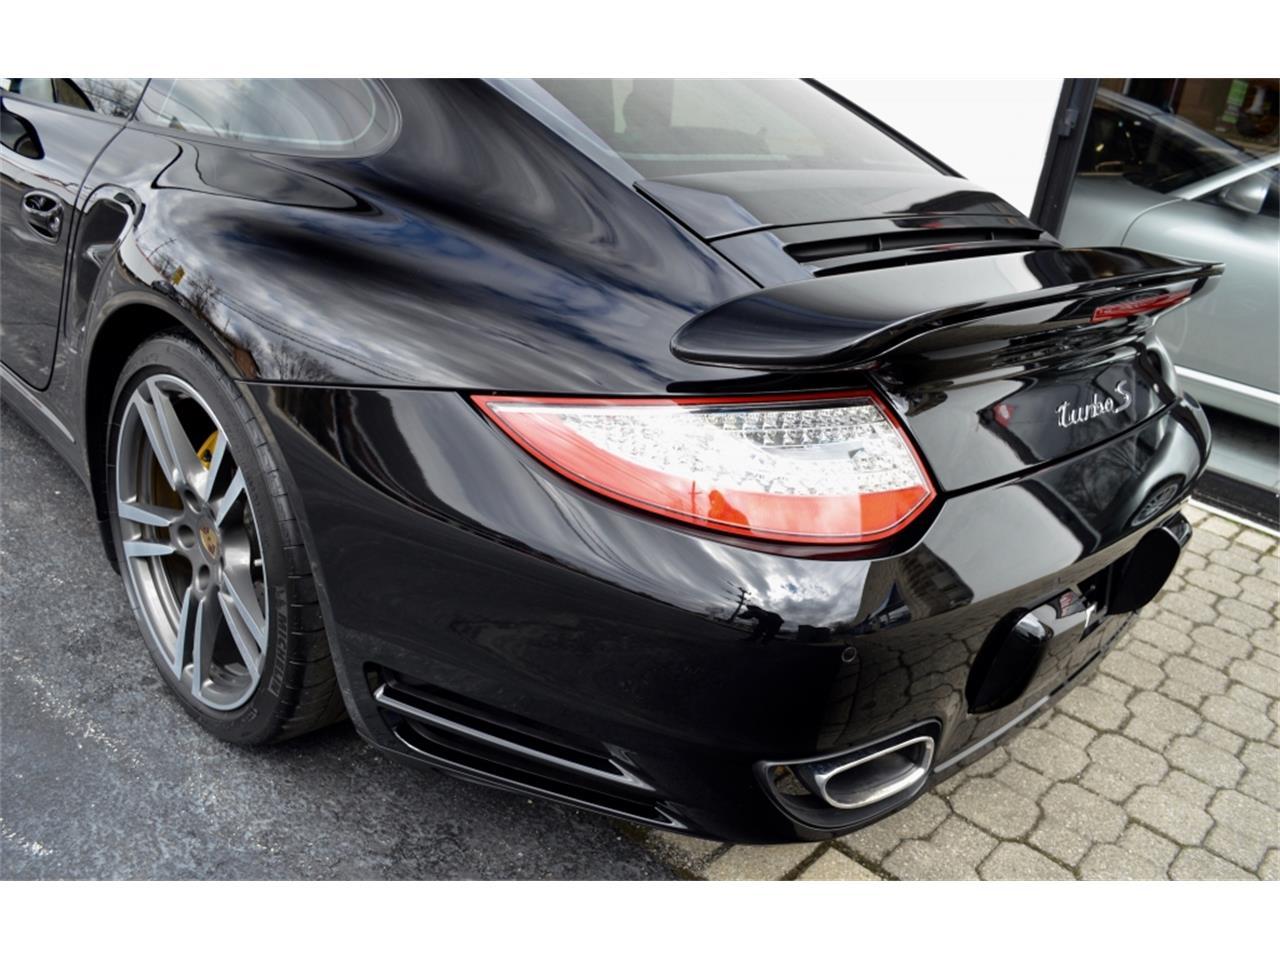 2011 Porsche 911 Turbo (CC-1268321) for sale in West Chester, Pennsylvania